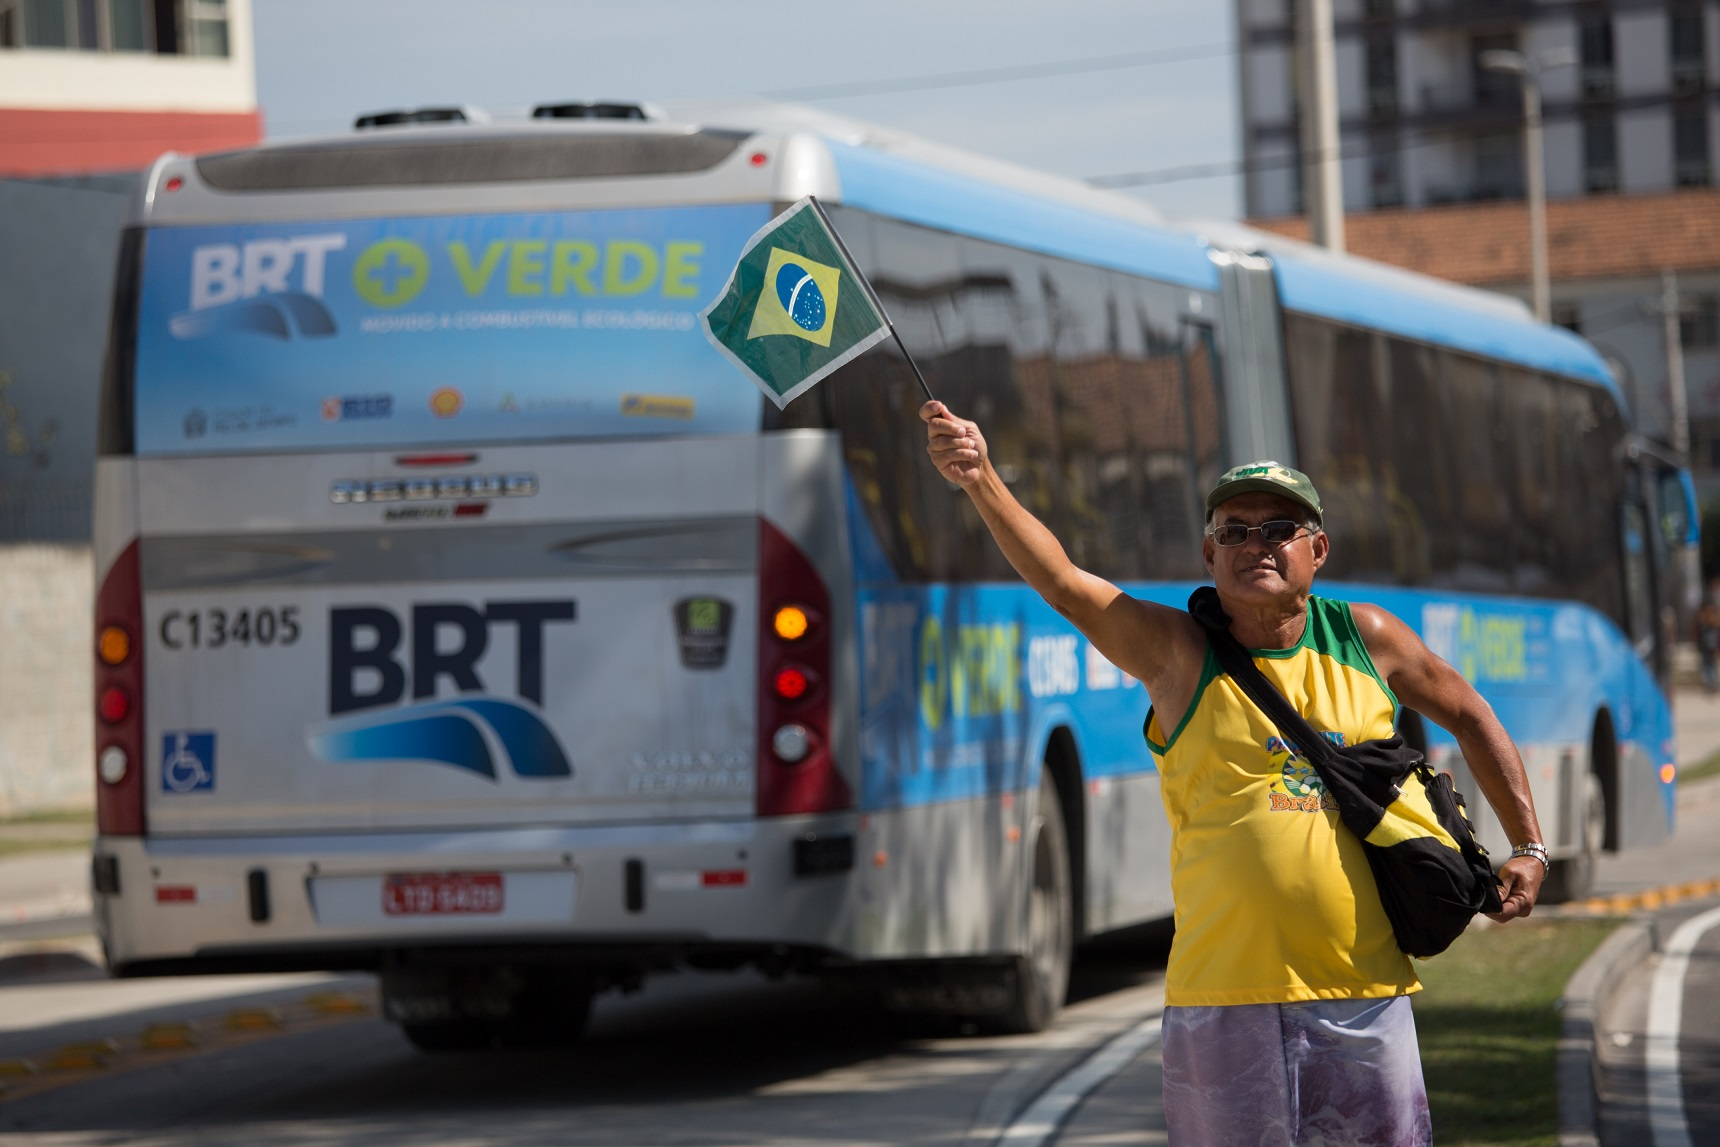 O BRT na Barra da Tijuca e a nova concorrência do metrô até o Recreio. Foto de Yosuyoshi Chiba/AFP